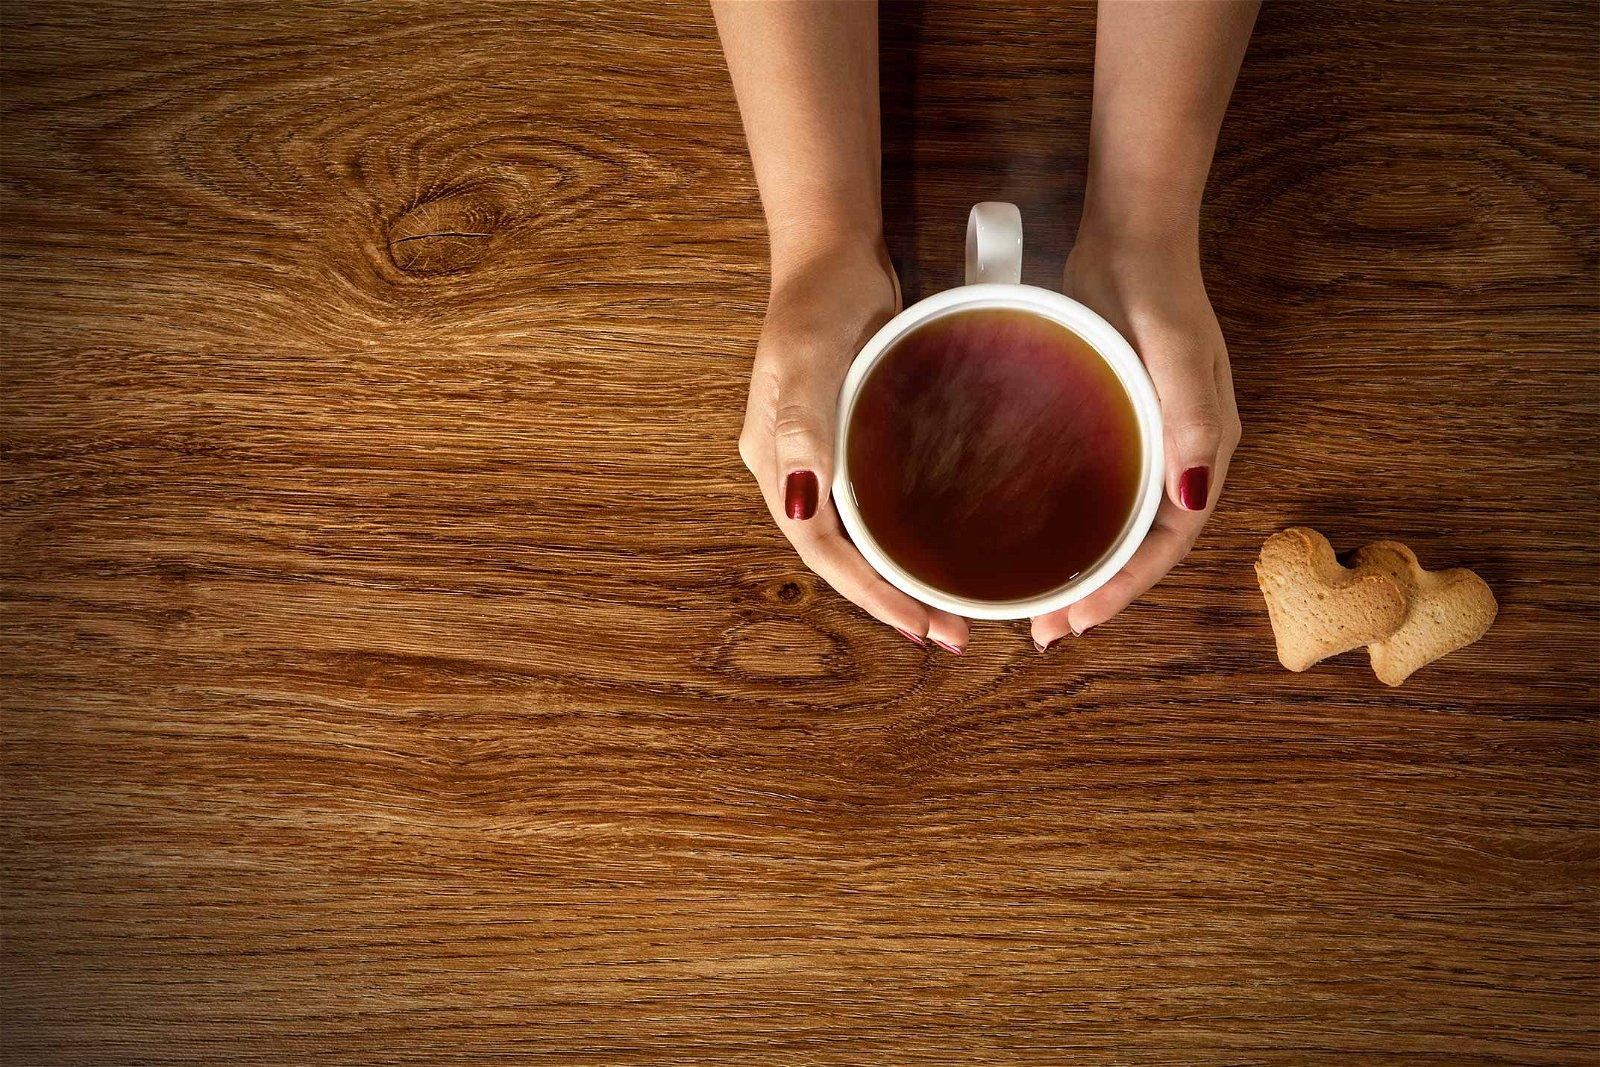 Tee Geschenke | Geschenkideen zum Tee - Jetzt bestellen